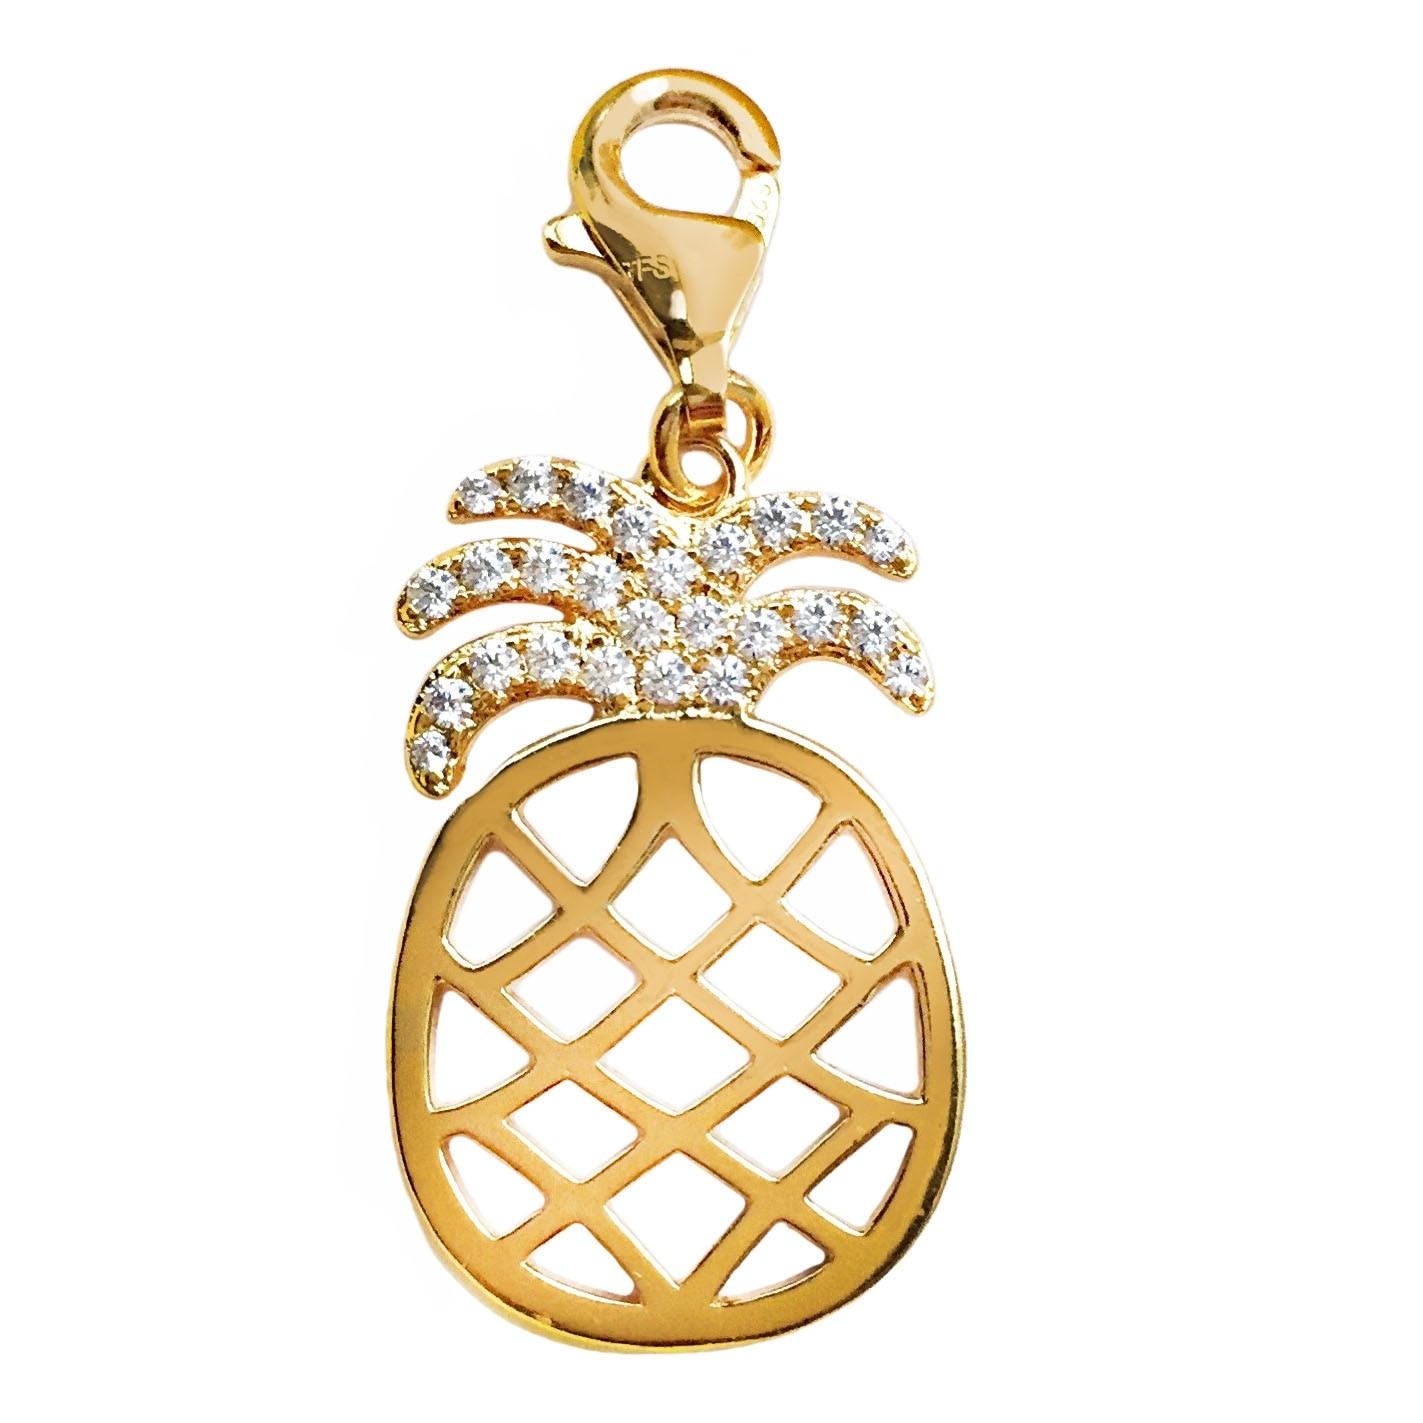 Julieta Jewelry Pineapple Clip-On Charm - Thumbnail 0